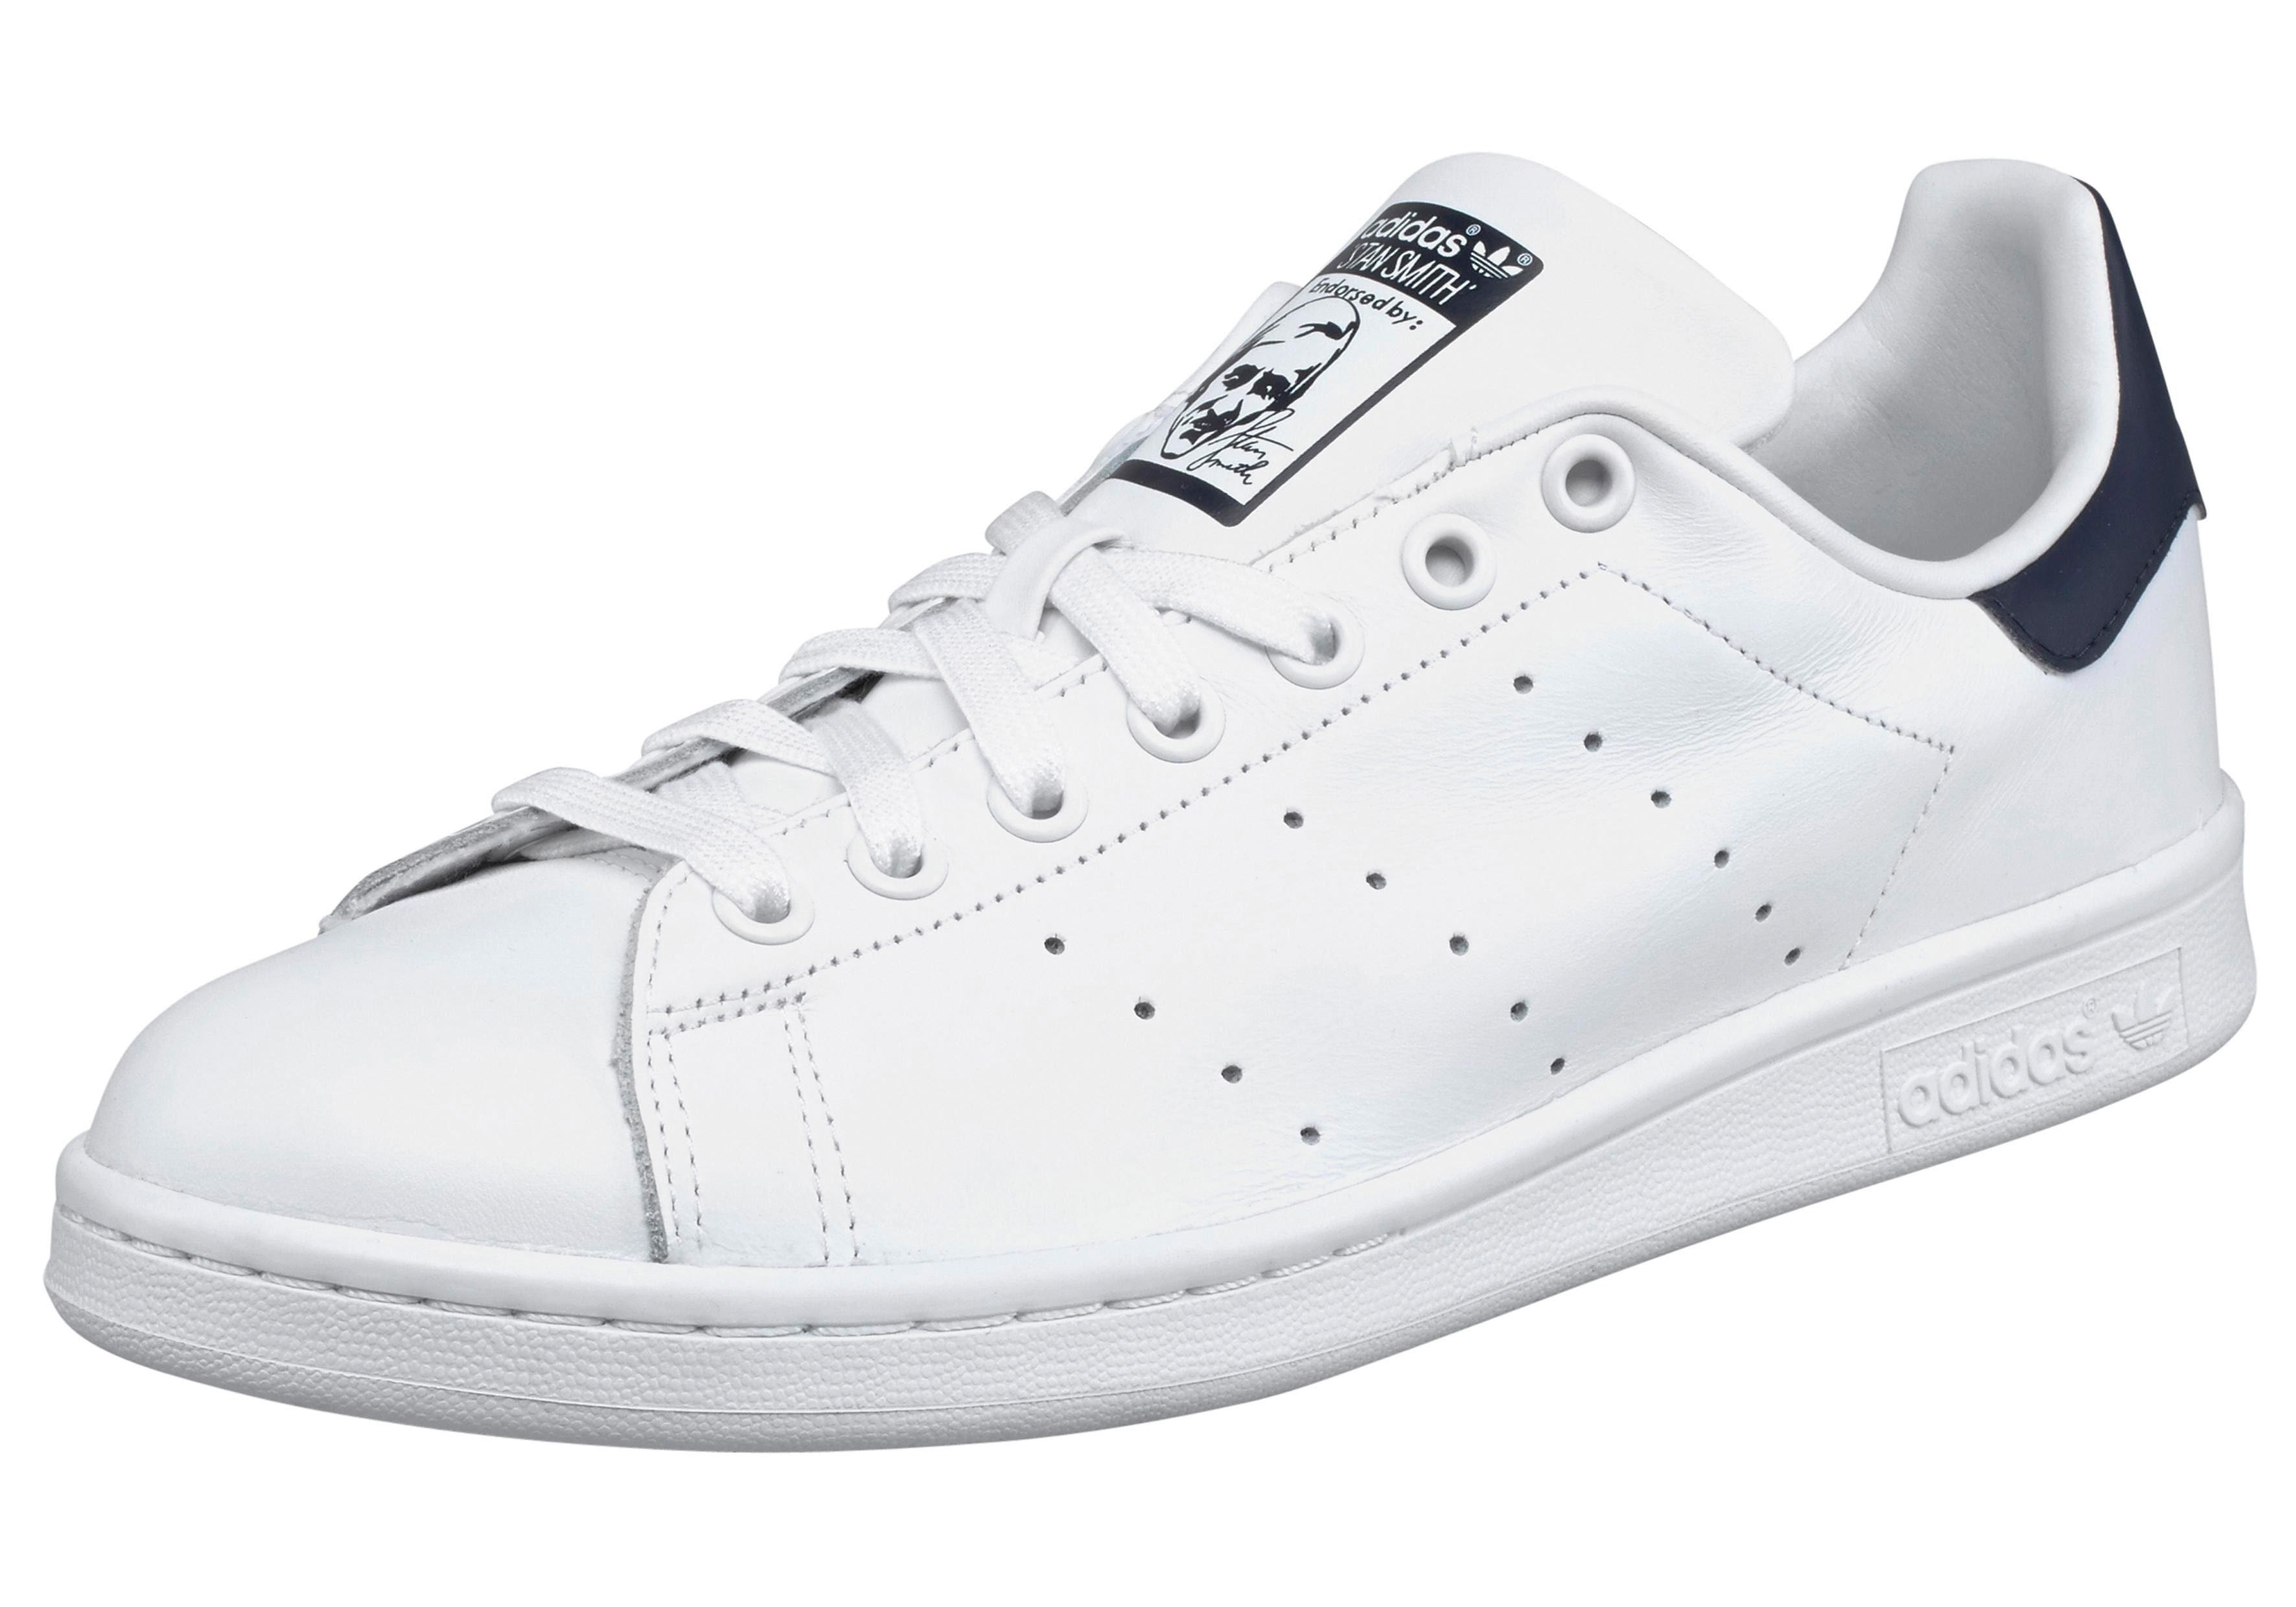 Adidas Stan Smith Mid Kopen Goedkoop Adidas Fitness